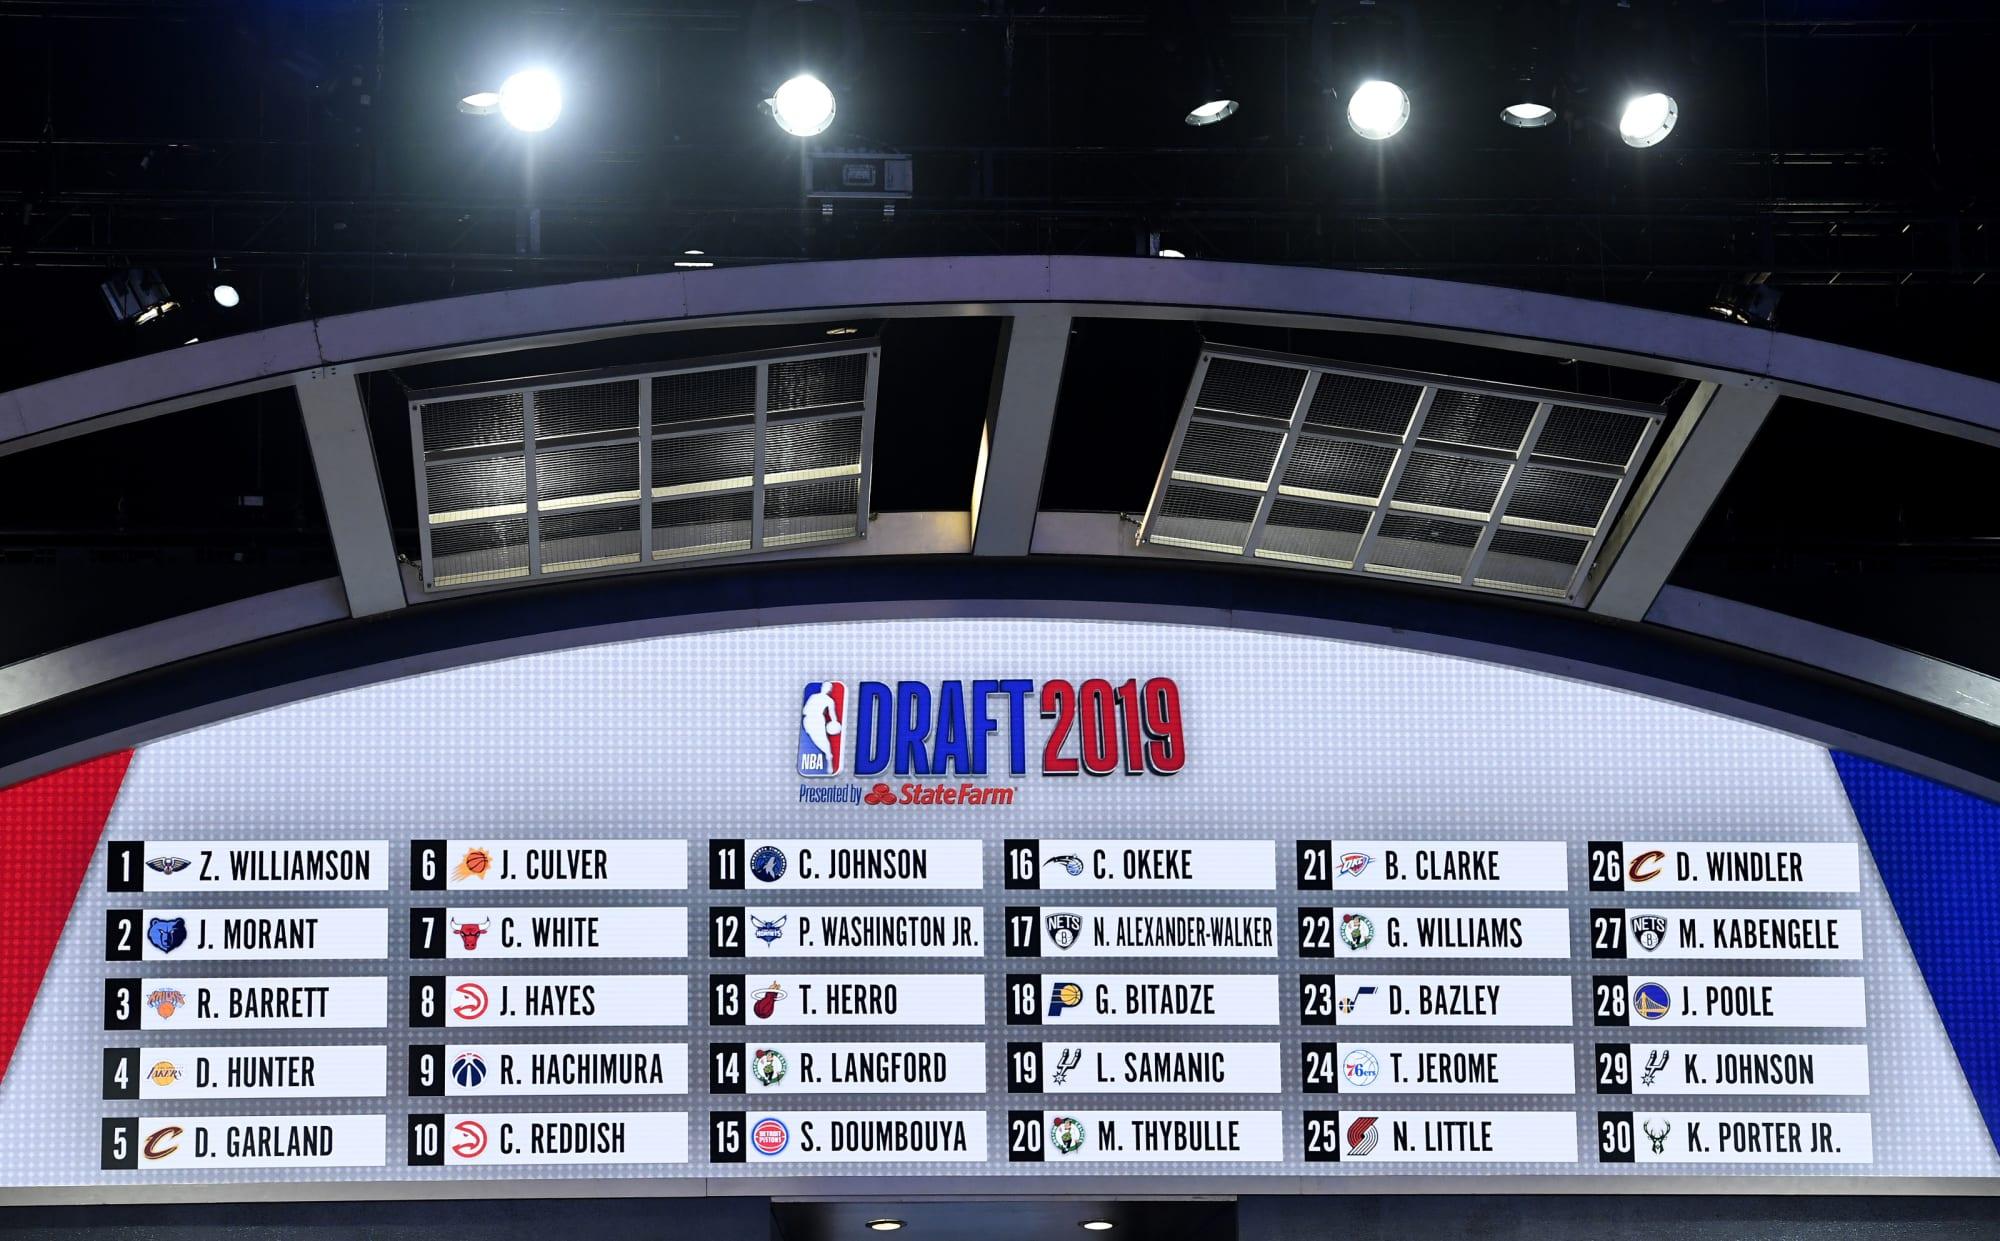 Toronto Raptors: 2021 NBA Draft Lottery presents unique opportunity